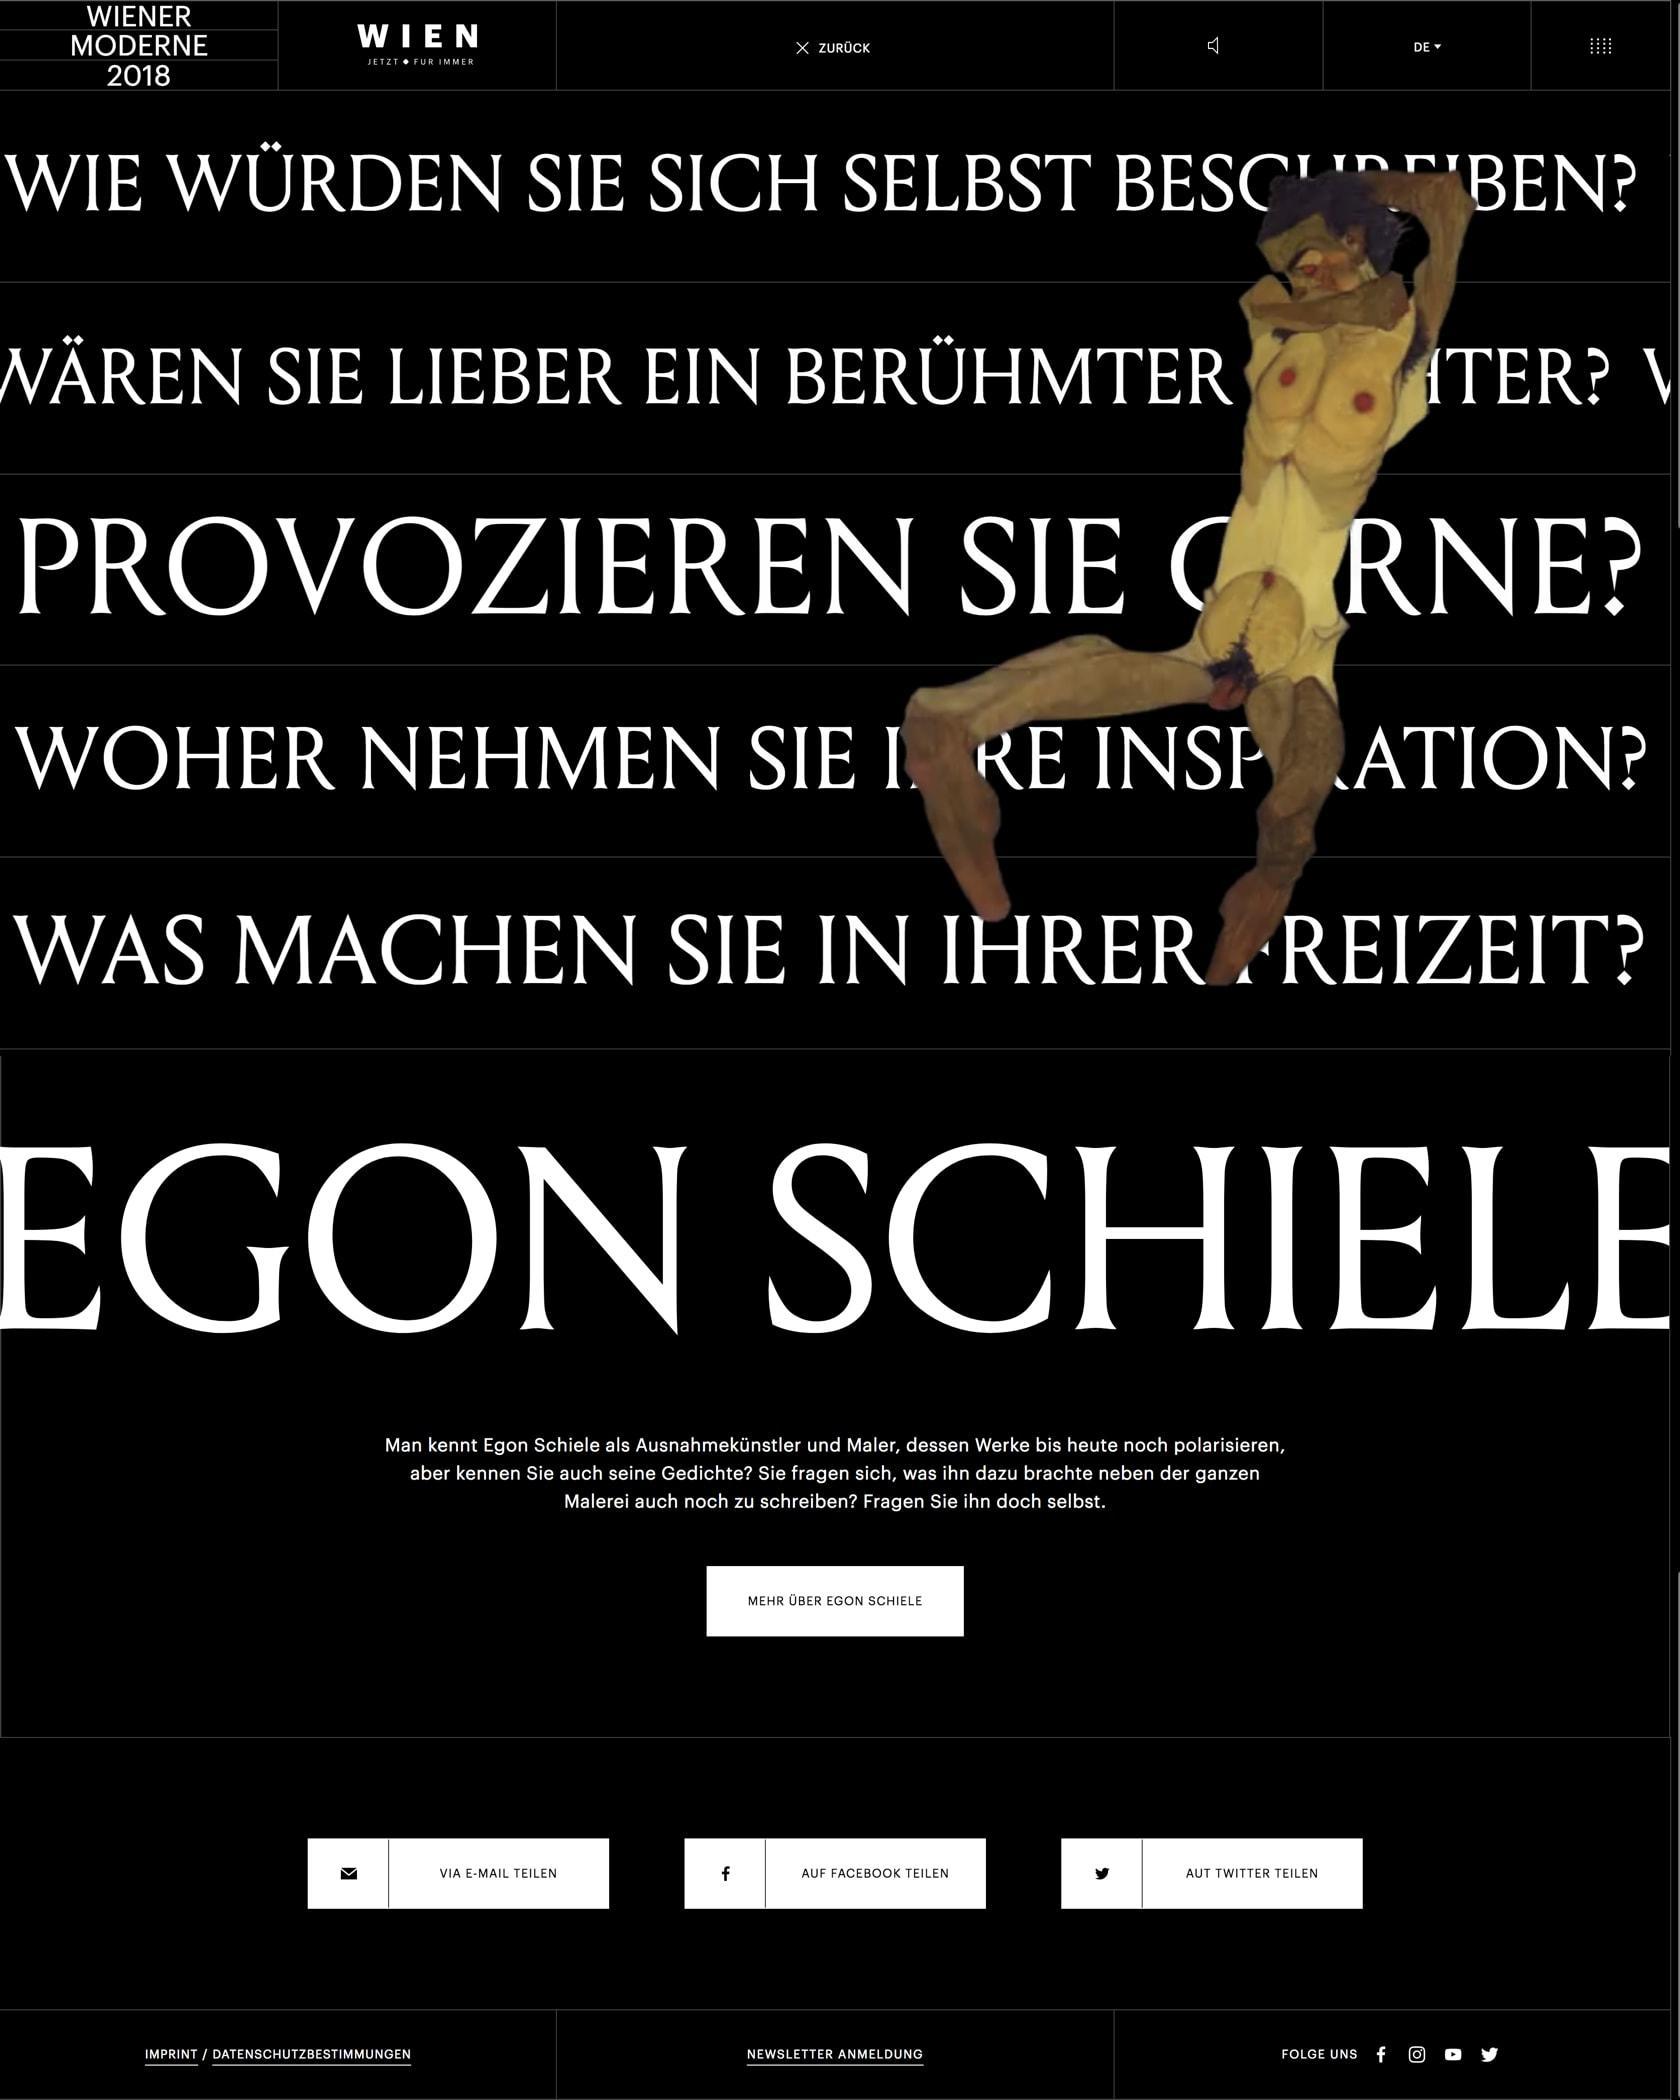 Wiener Moderne 04